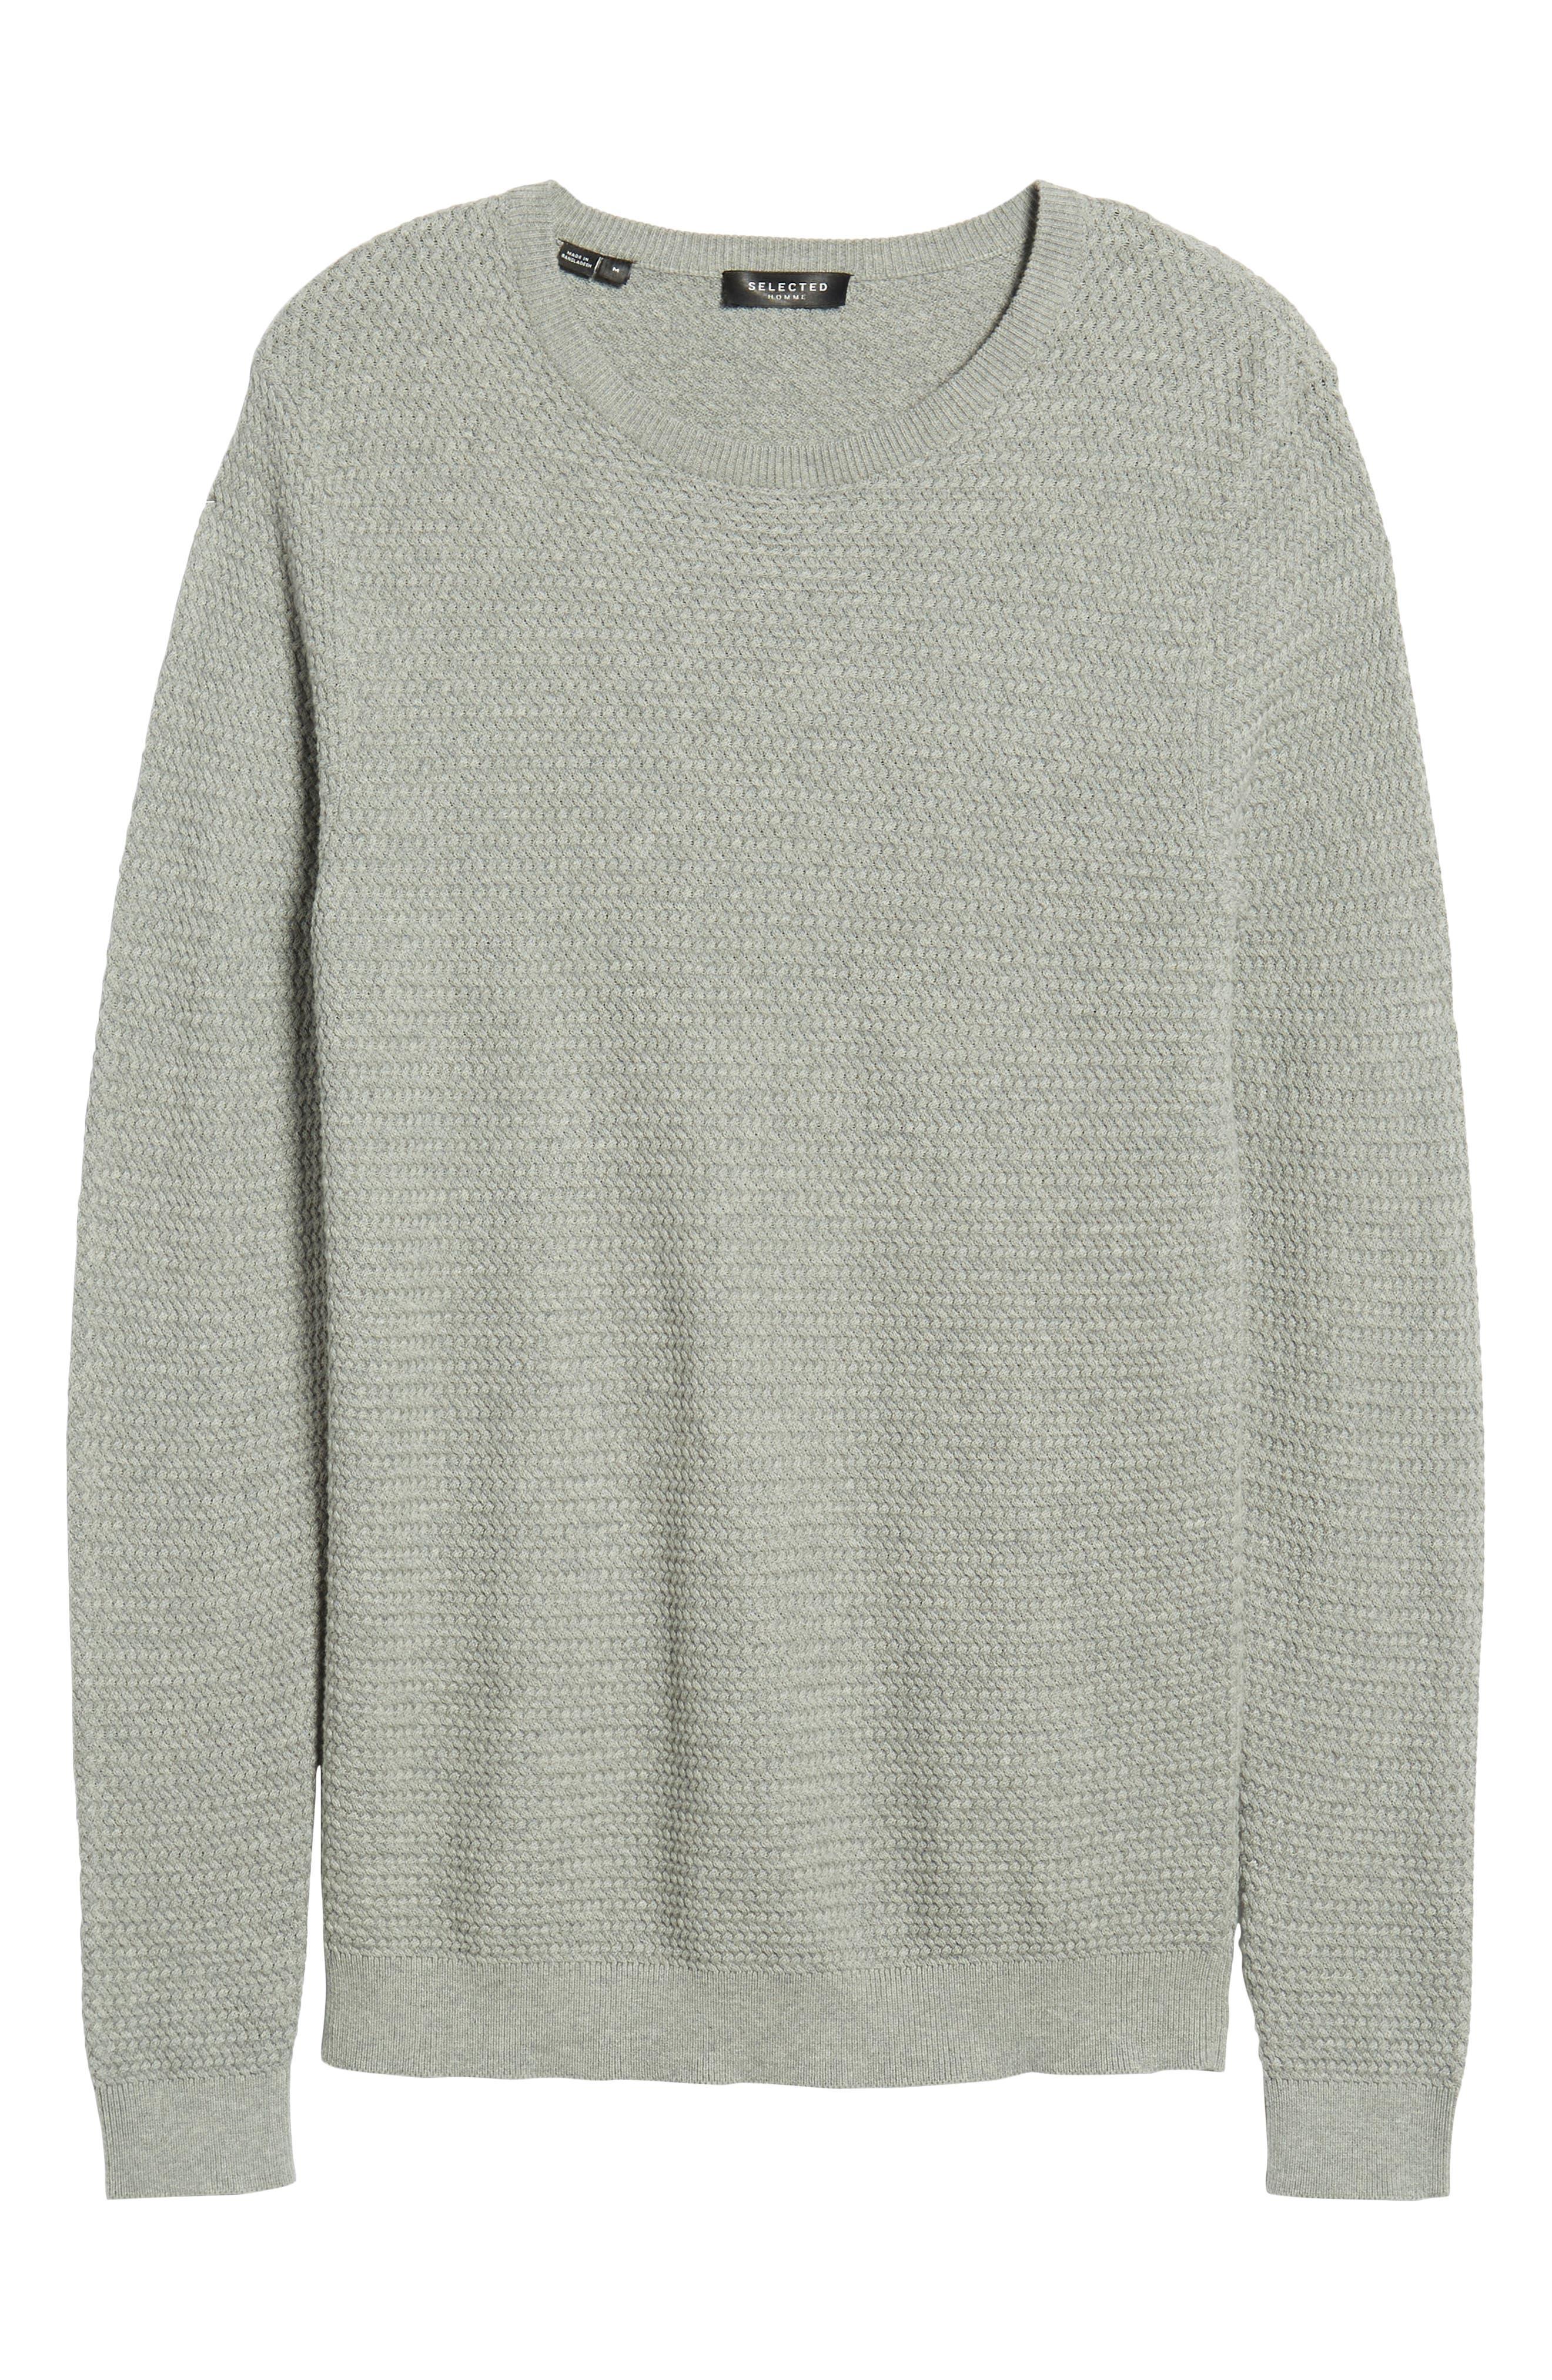 Martin Regular Fit Crewneck Sweater,                             Alternate thumbnail 6, color,                             MEDIUM GREY